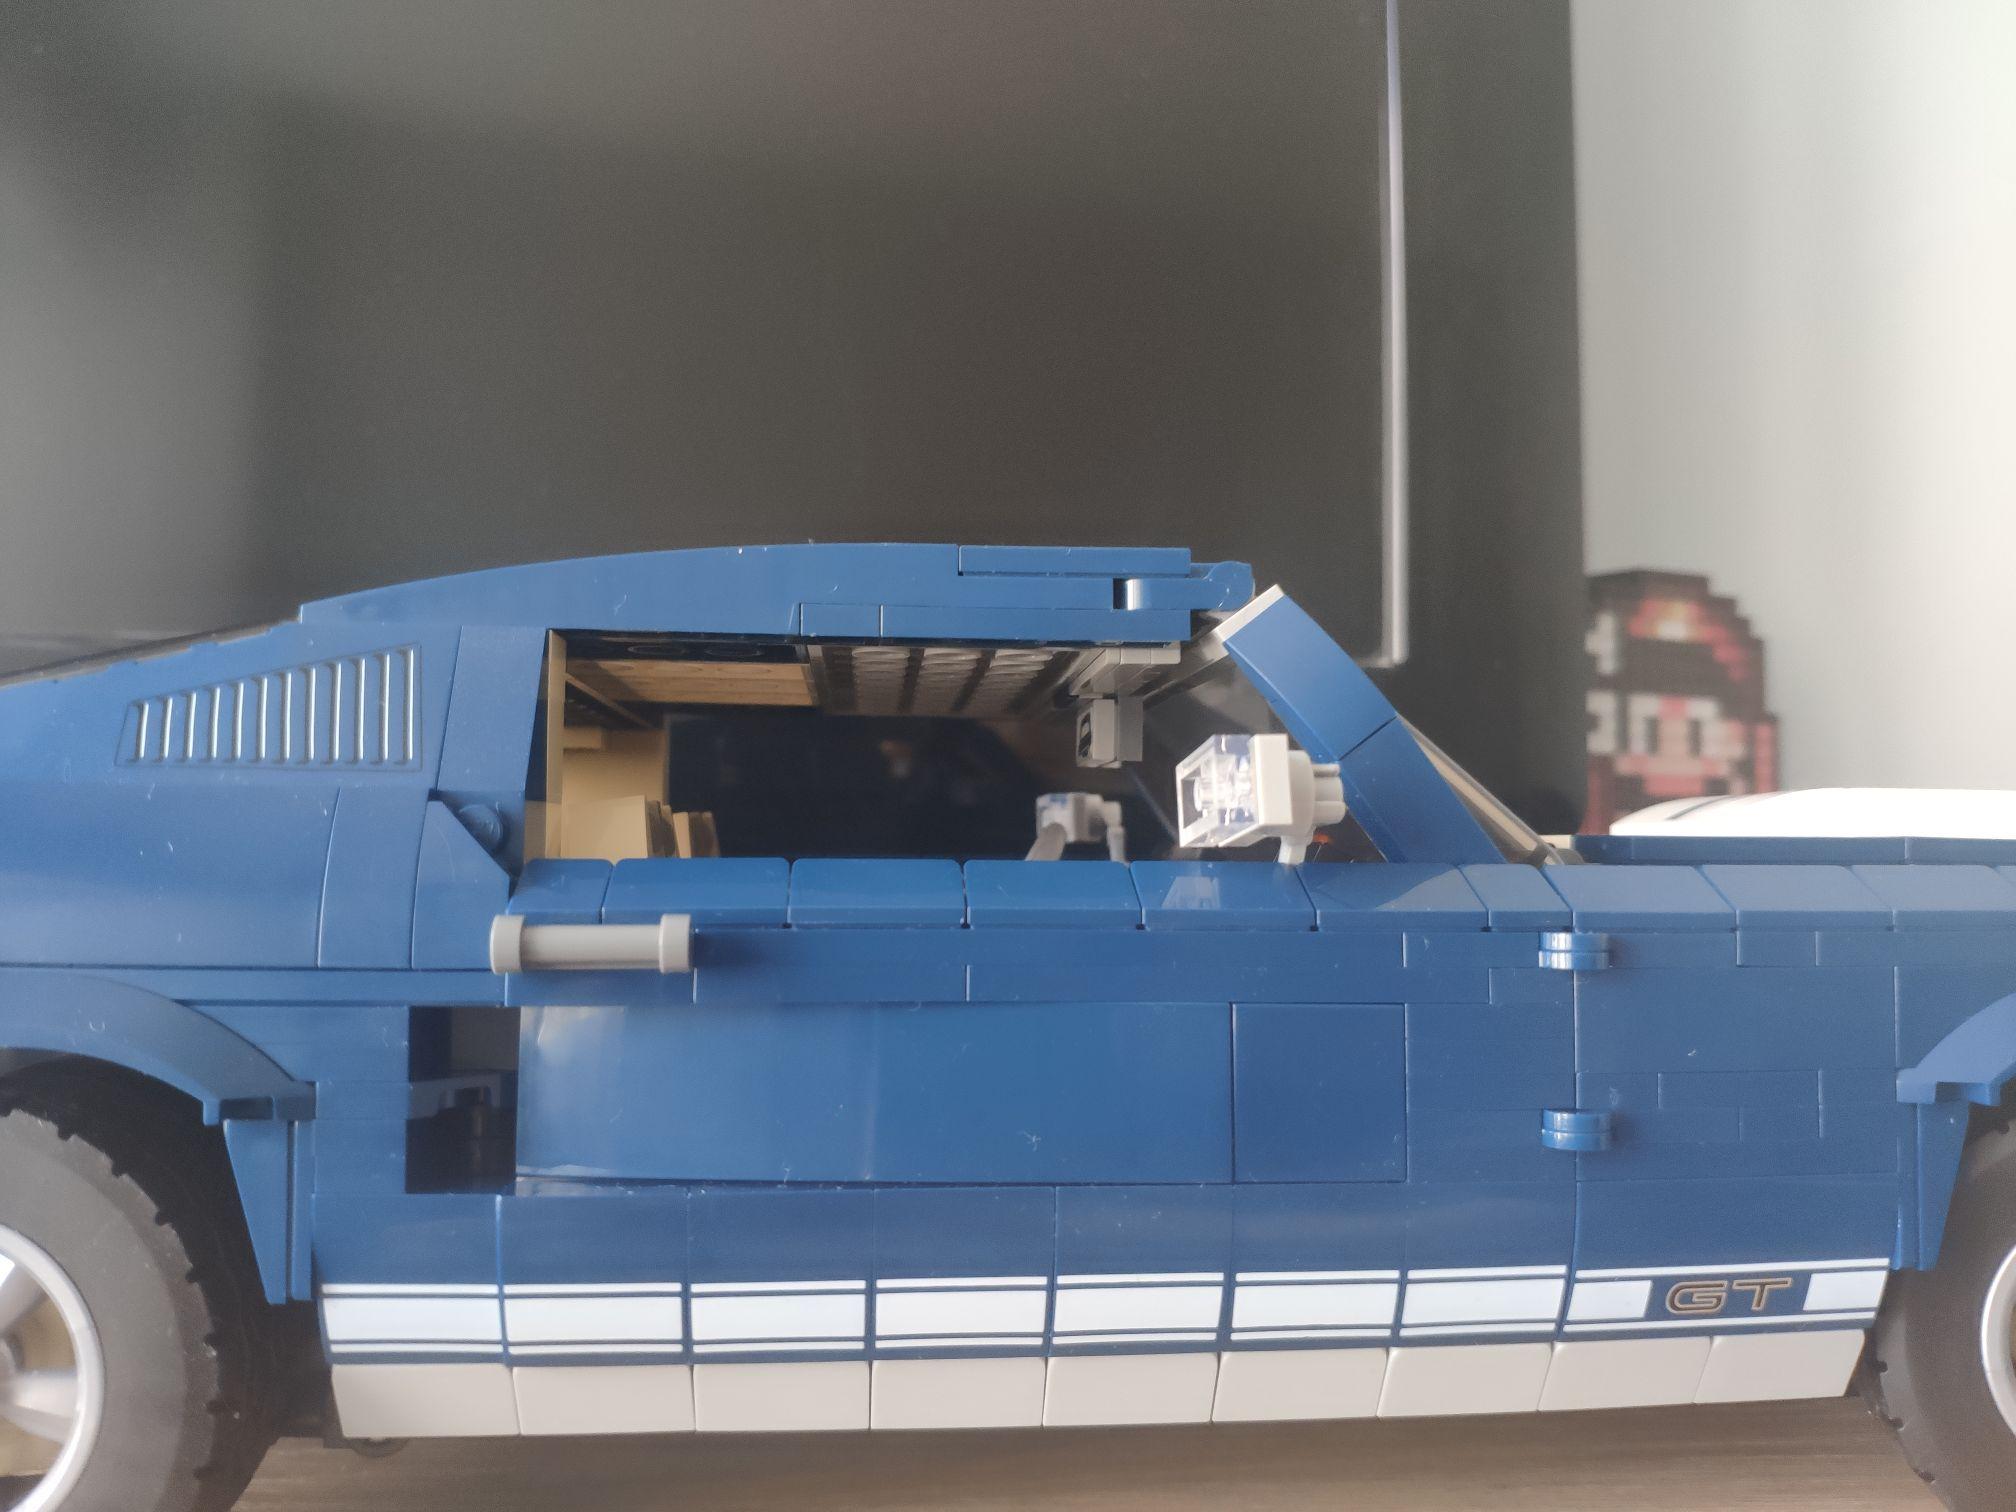 Lego Ford Mustang 10265vendeur Expert Creator Jouet Tiers u3clFJTK15